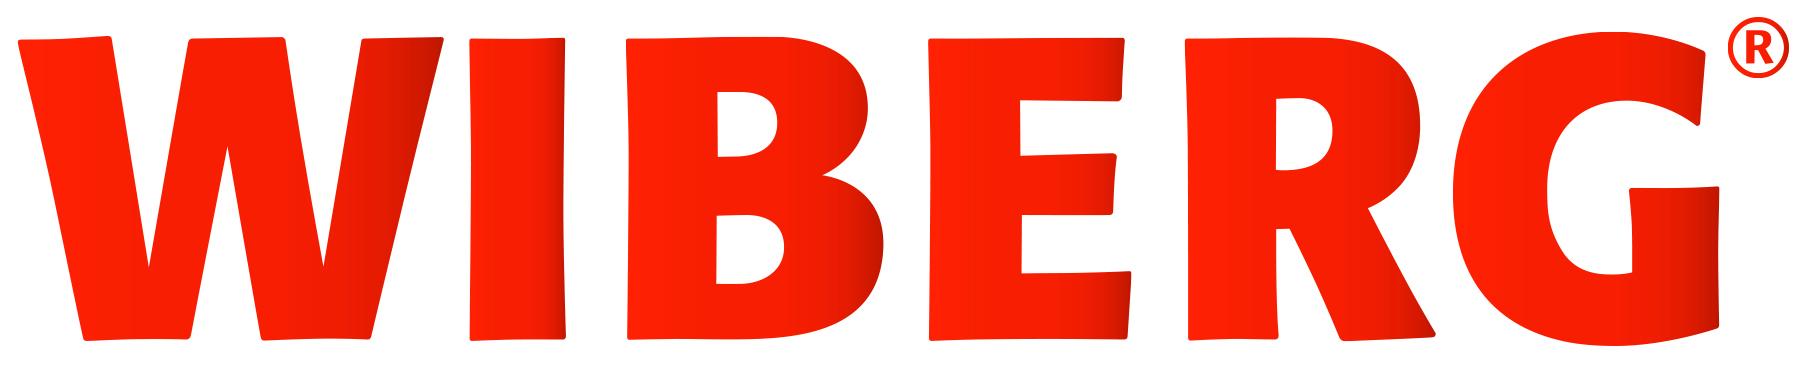 WIBER Logo